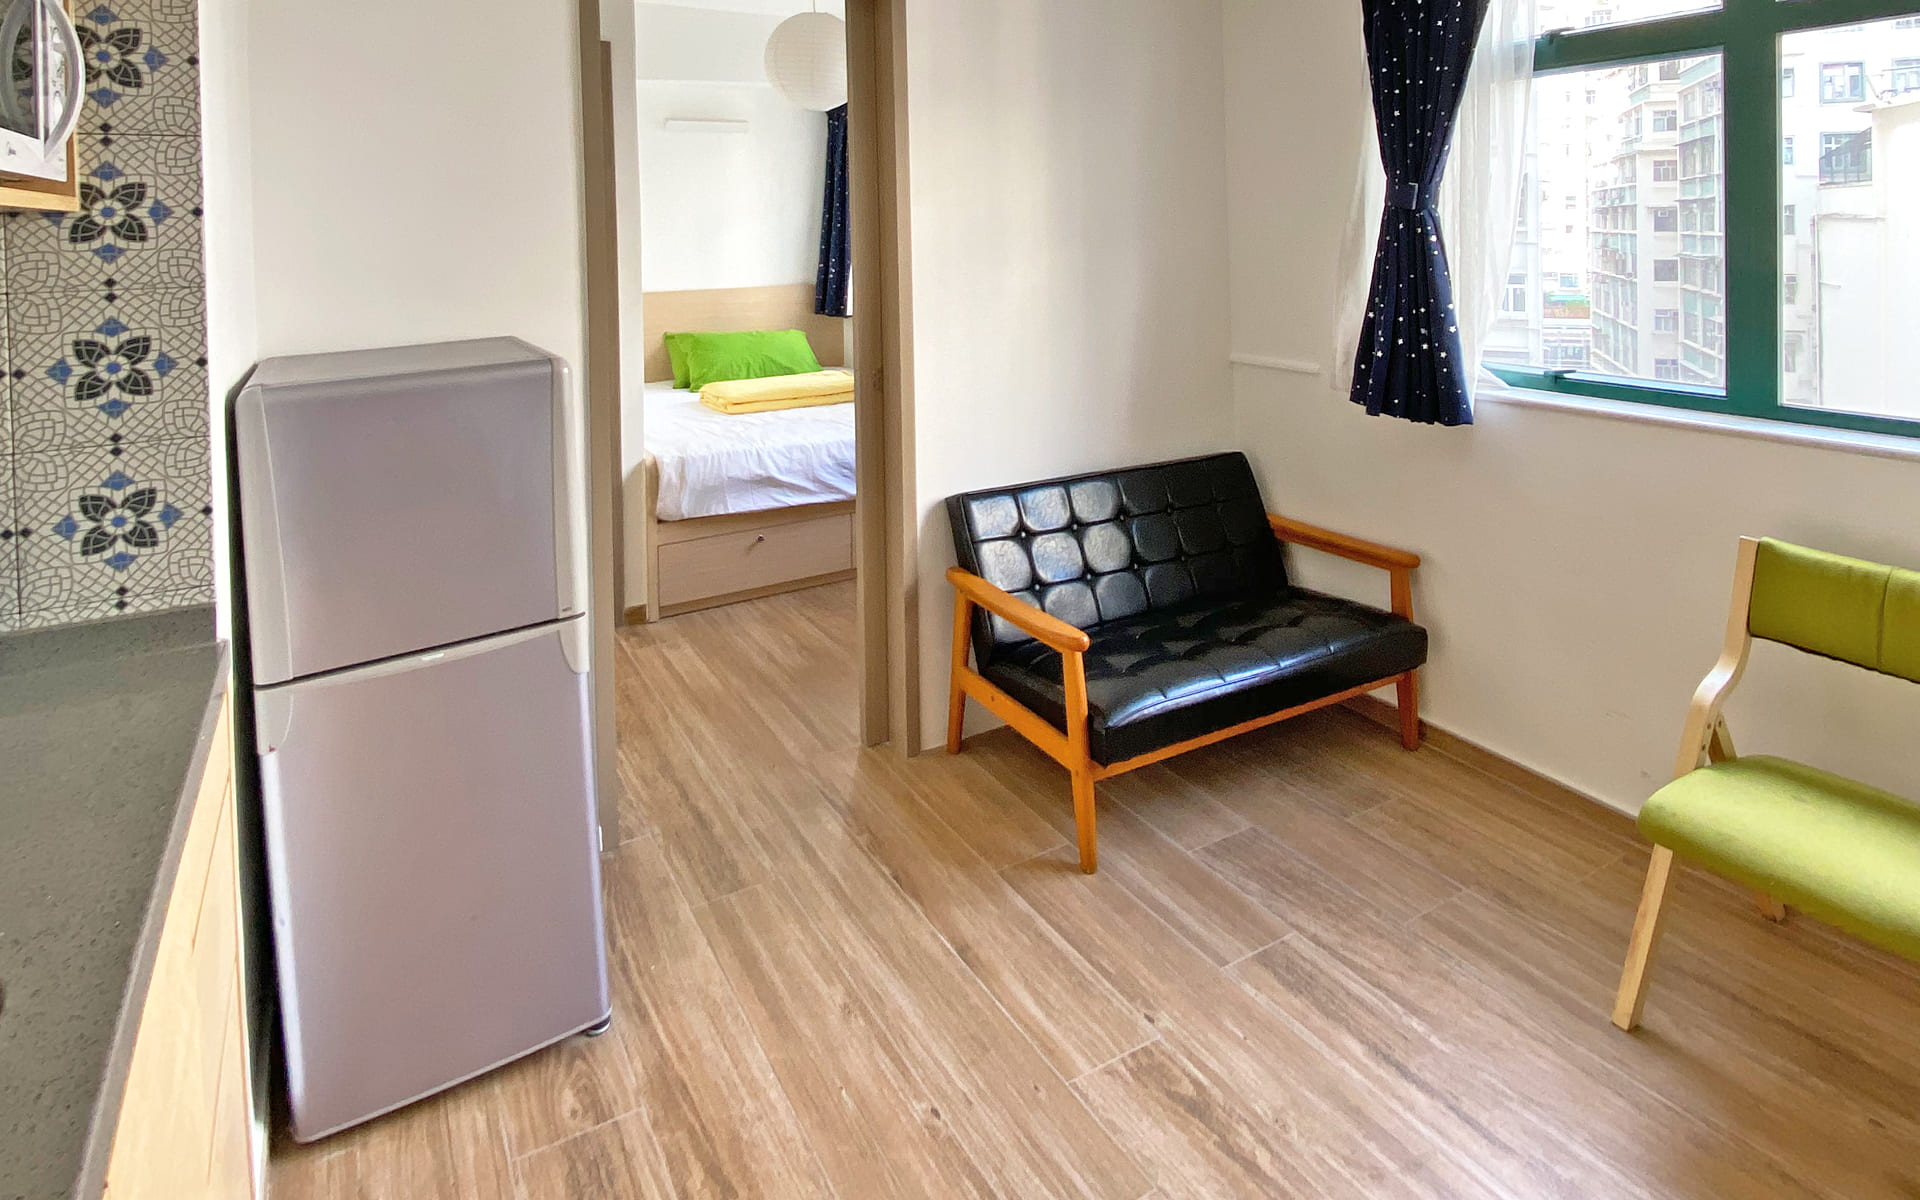 FTH Serviced Apartment 5b6 -1bdrm Apart.